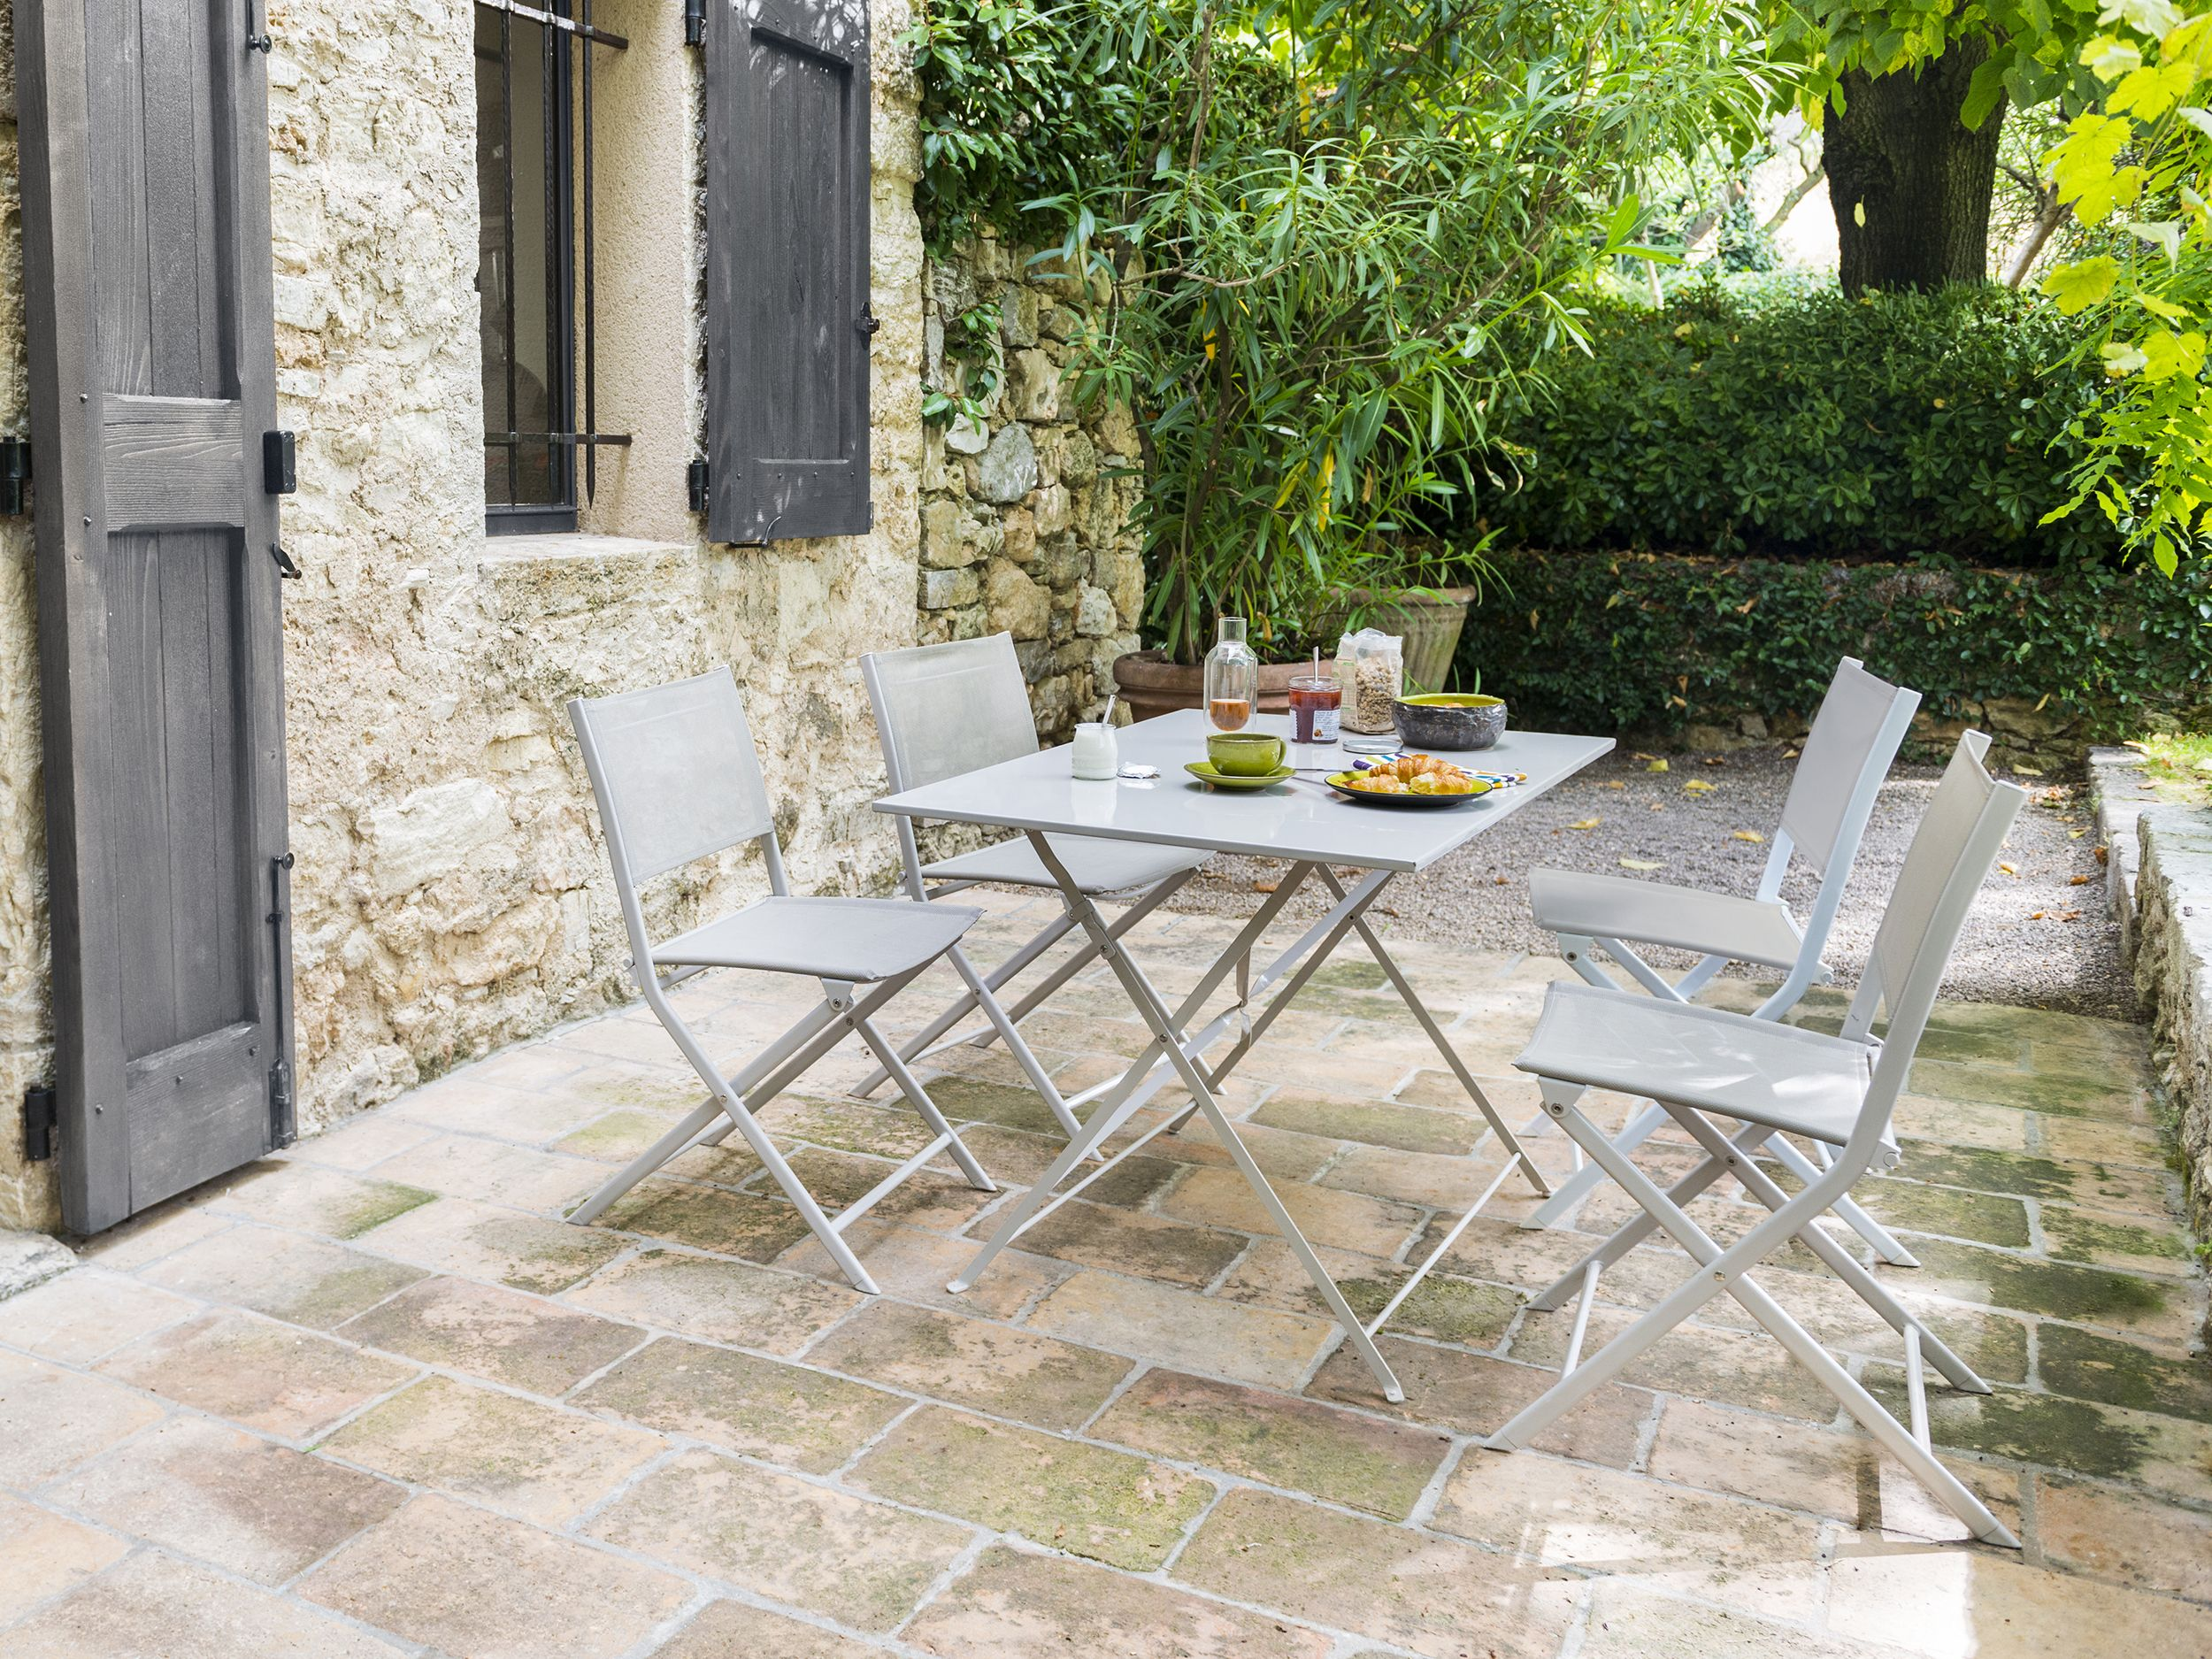 mobilier blooma saba castorama garden outdoor decor outdoor furniture sets et outdoor. Black Bedroom Furniture Sets. Home Design Ideas